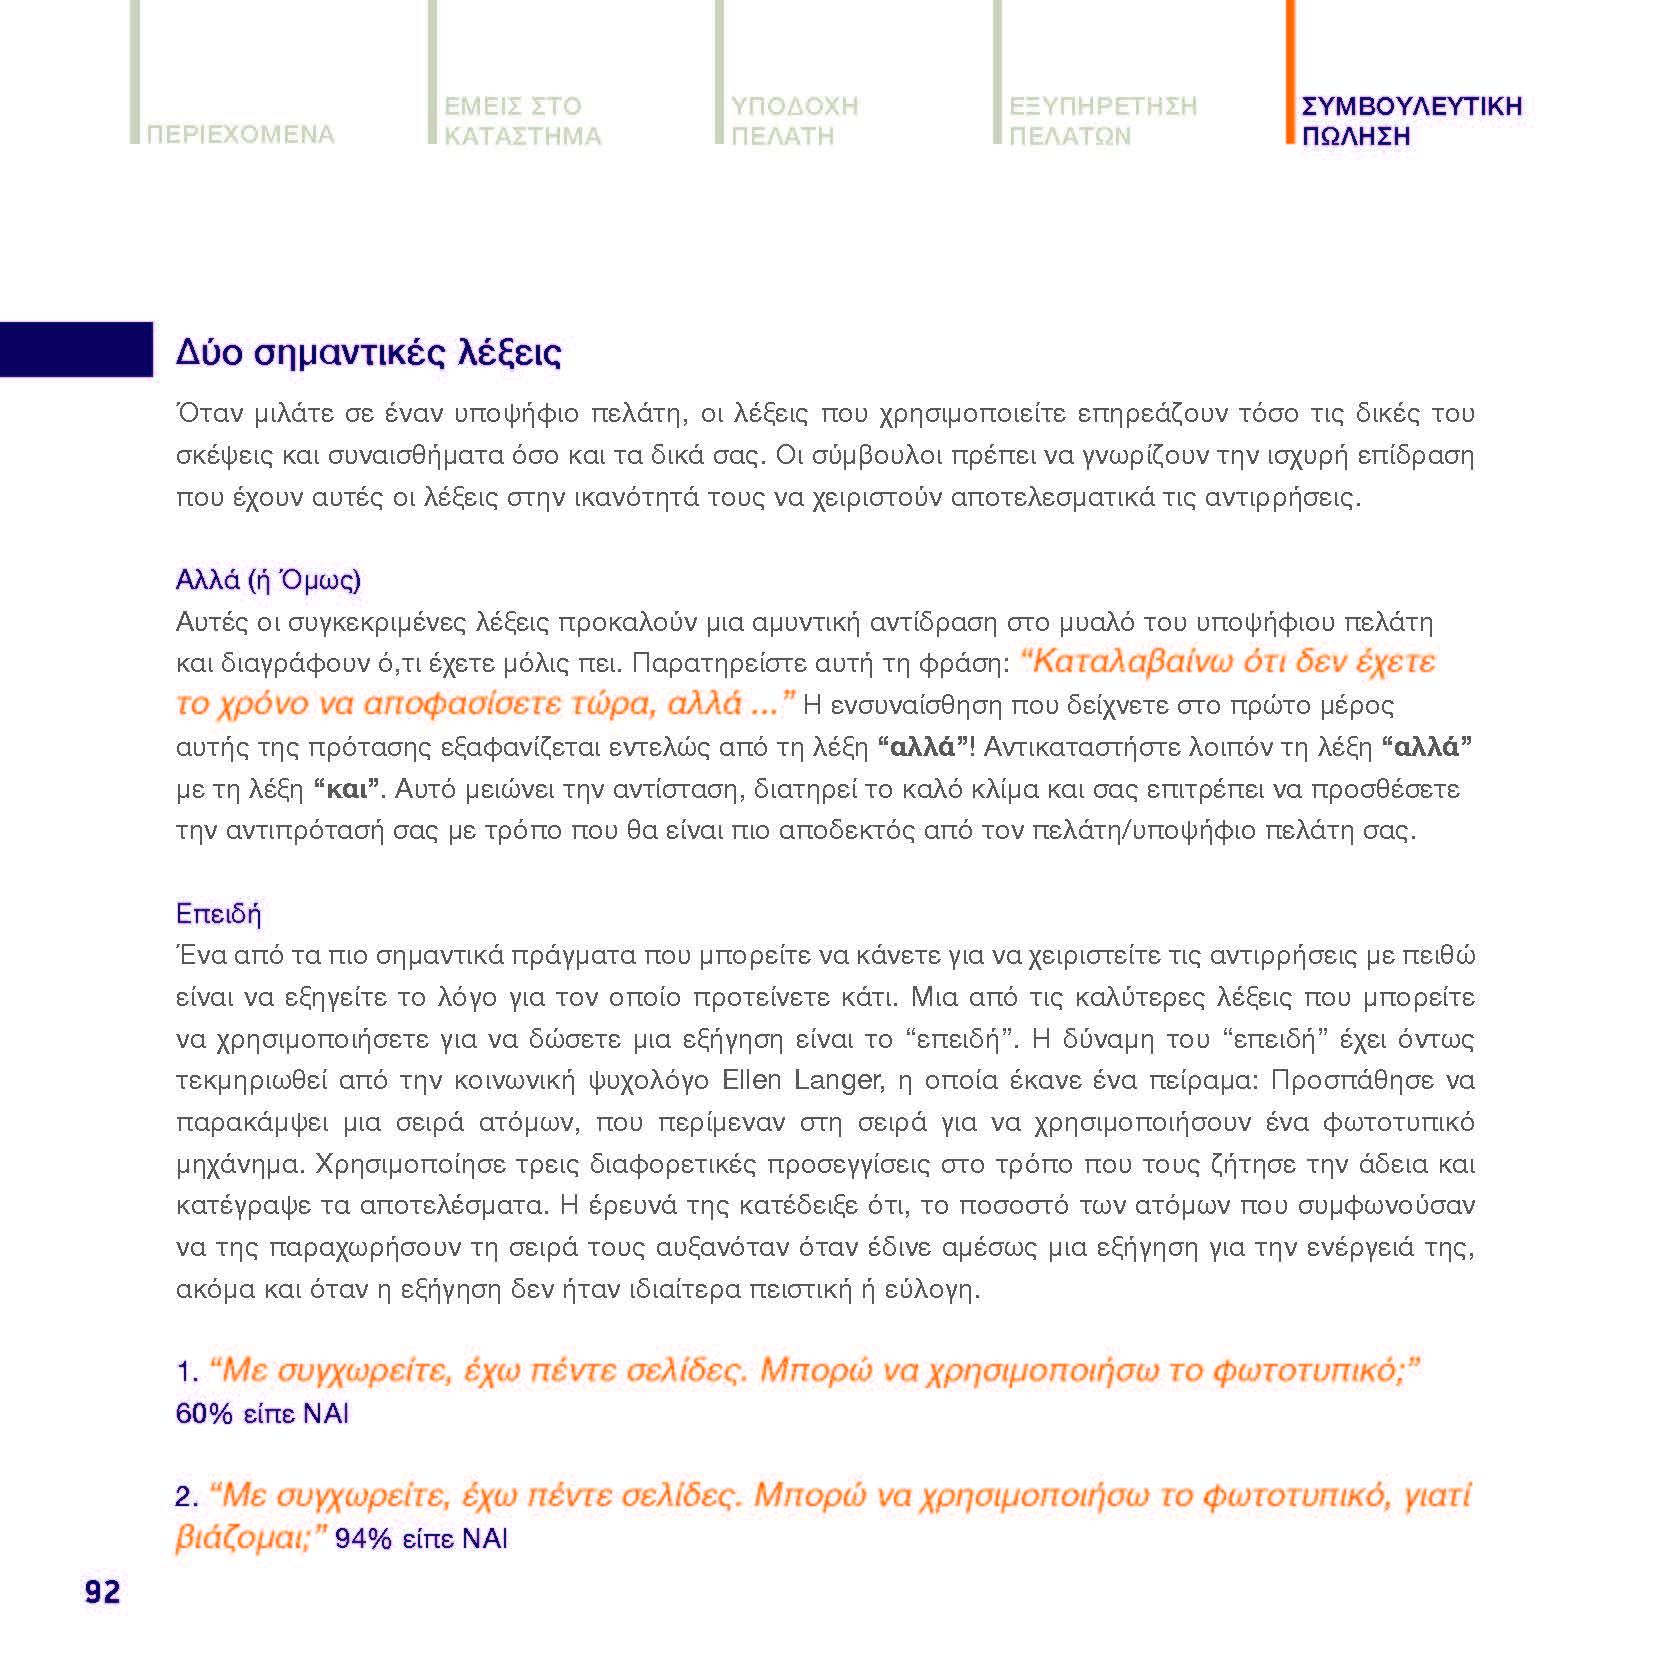 https://www.jib.gr/wp-content/uploads/2020/09/OPTIMA-BANK-BOOKLET-WEB_Page_092.jpg